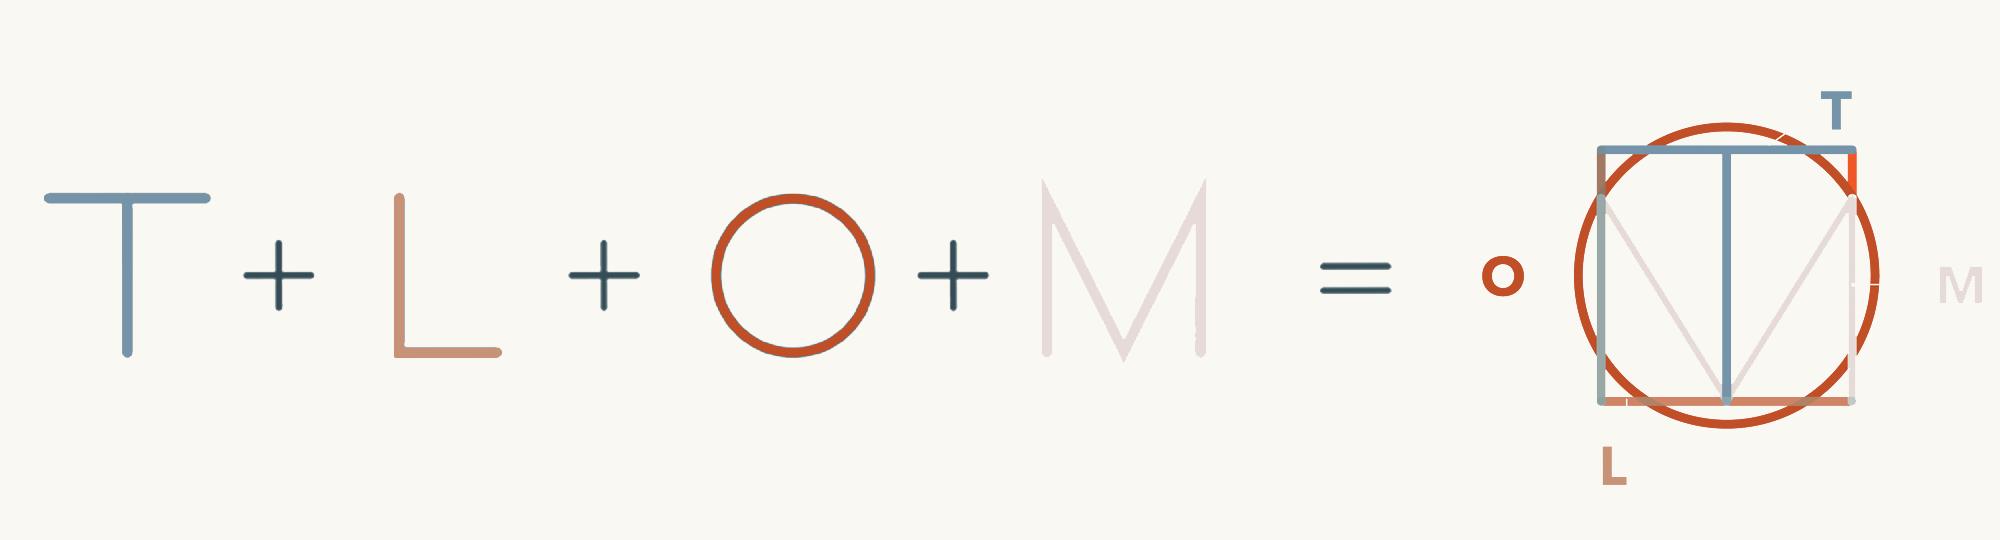 tlom-breakdown-header_MAIN.png